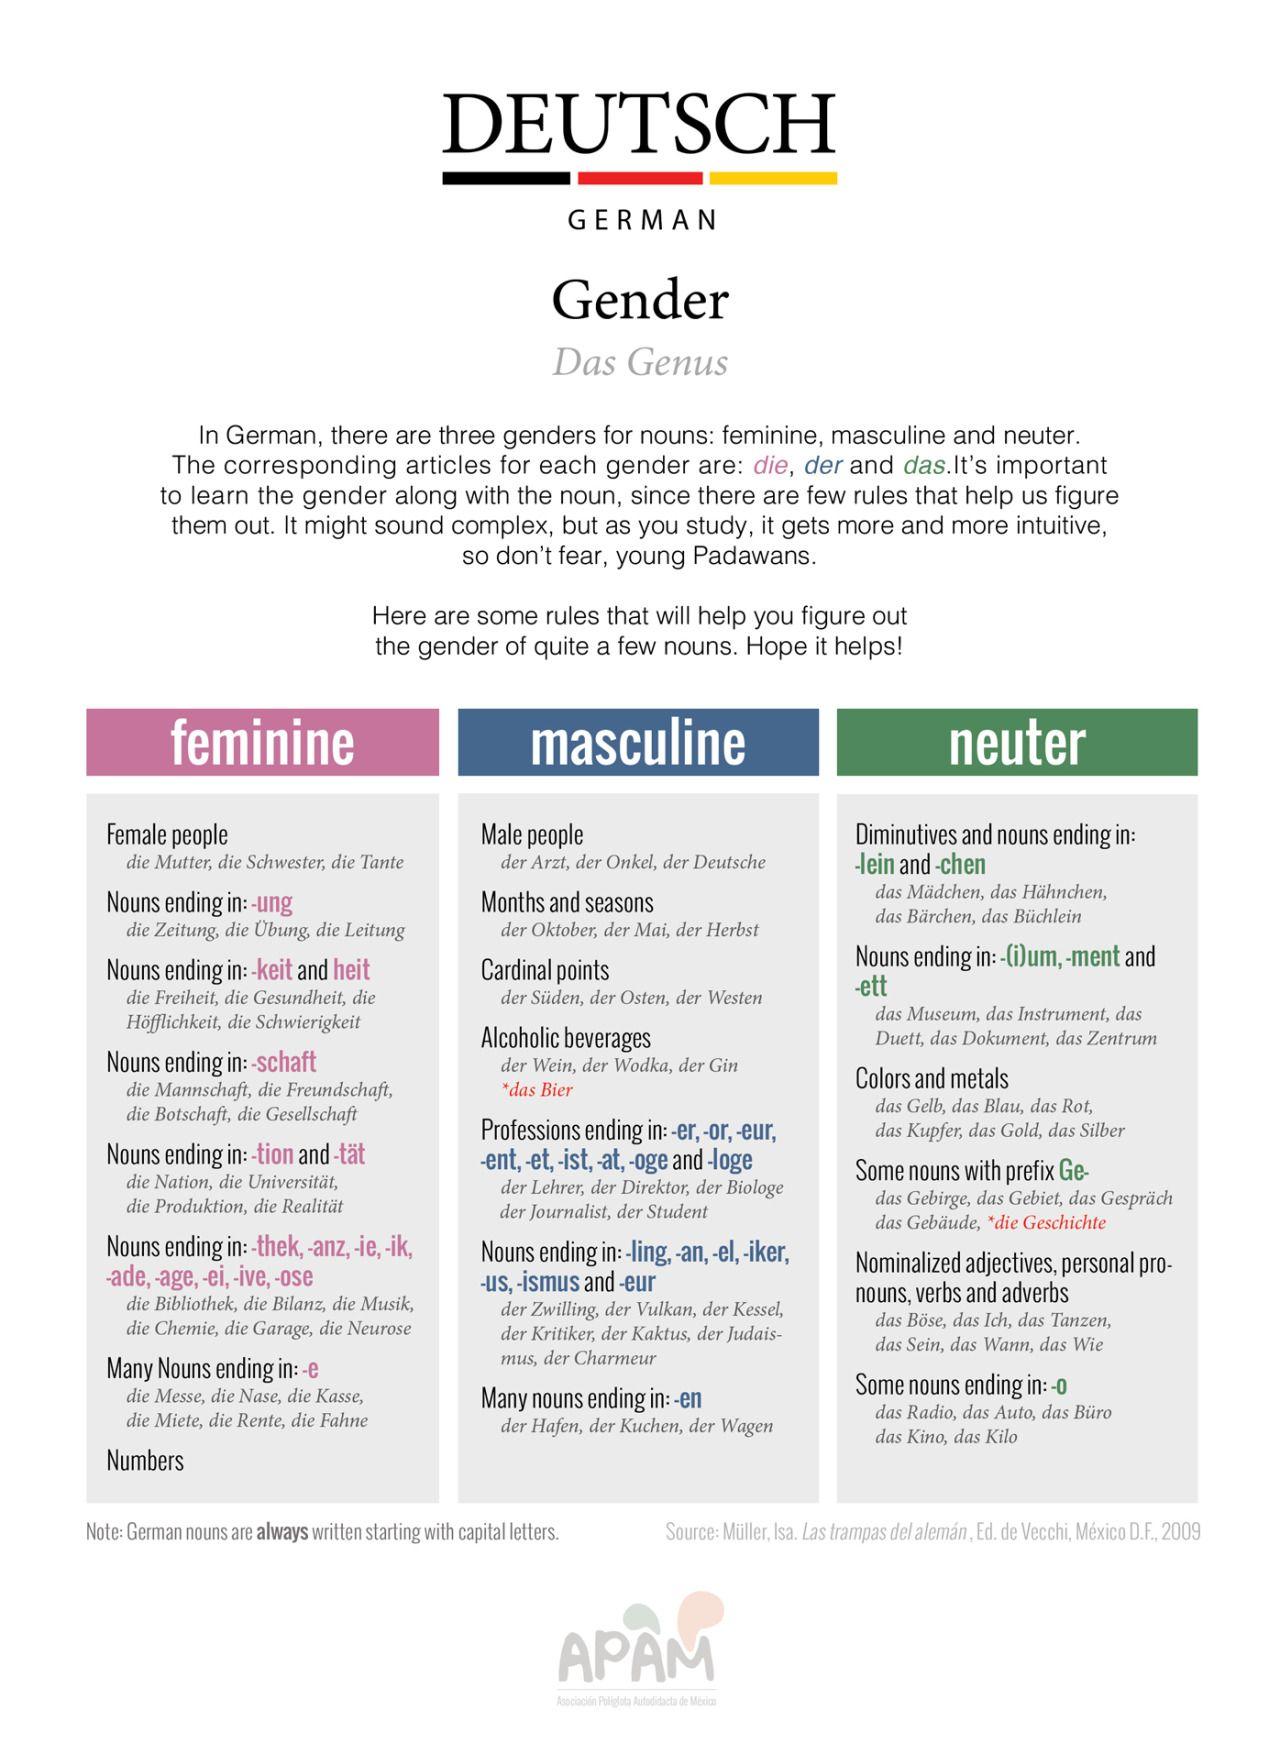 Romance Language Learning — apamexico: Gender of German nouns! Download